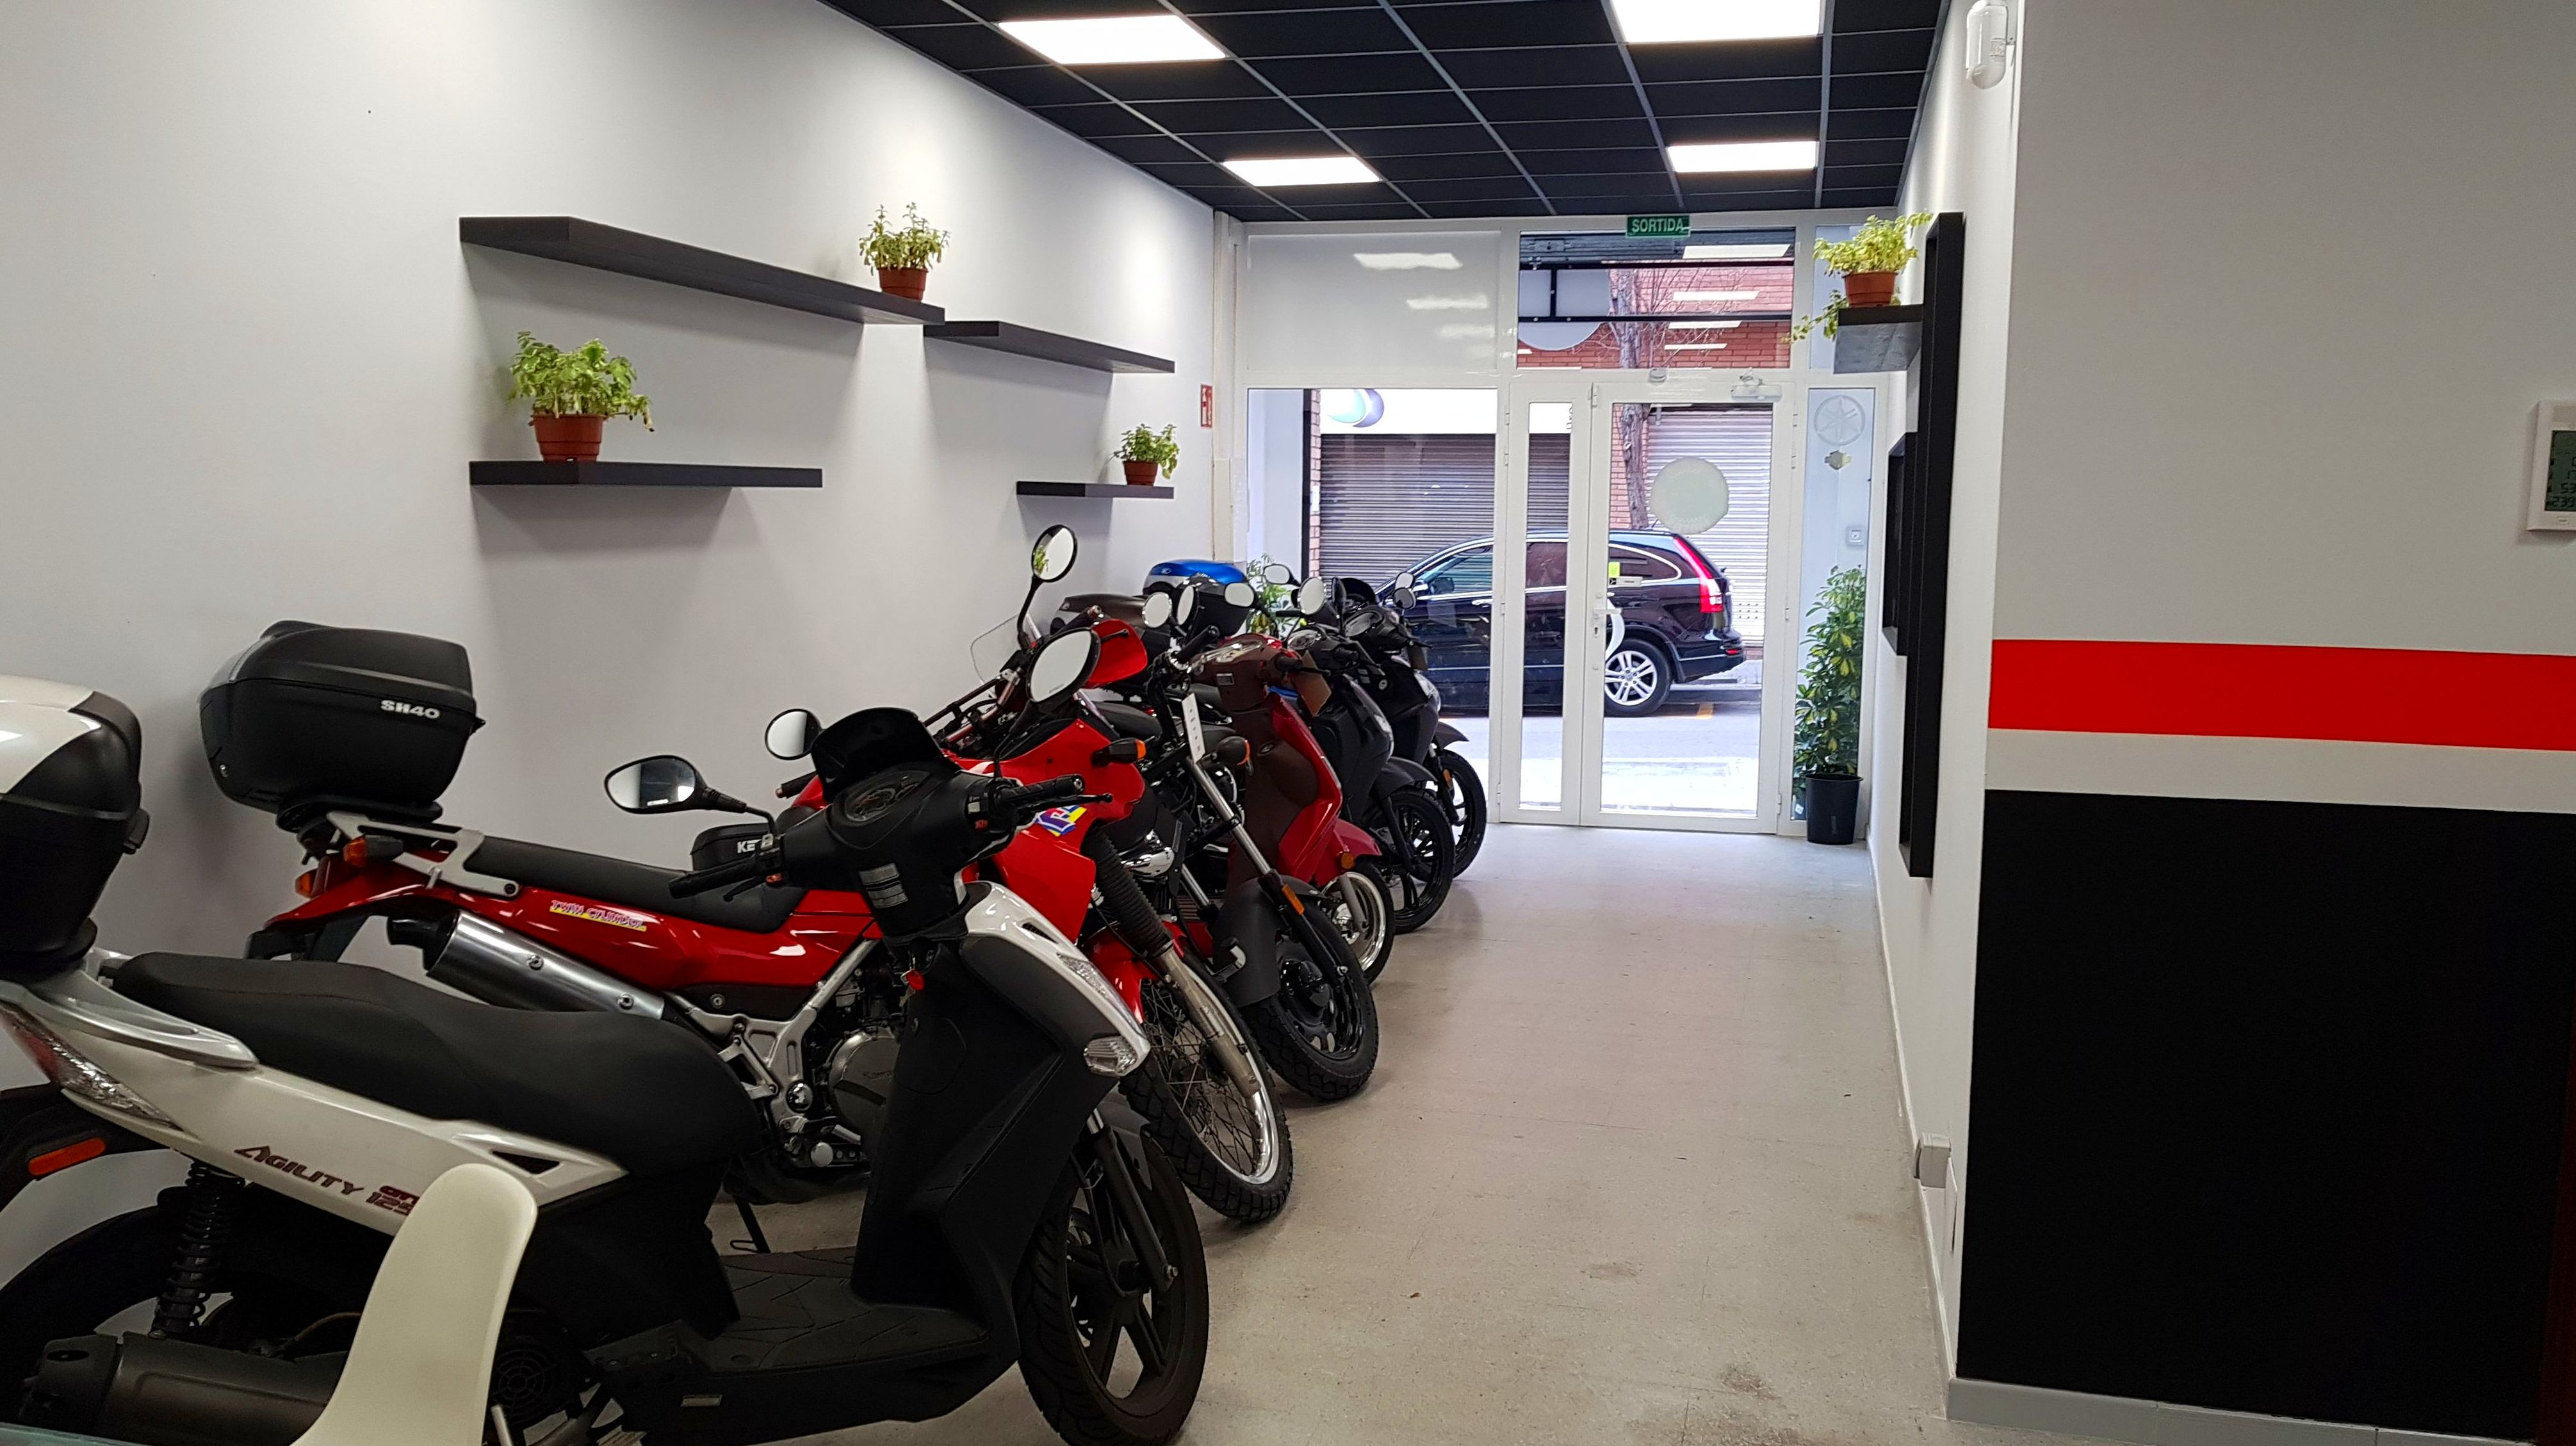 Foto 25 de Taller de motos multimarca en Mataró | Motos Iluro